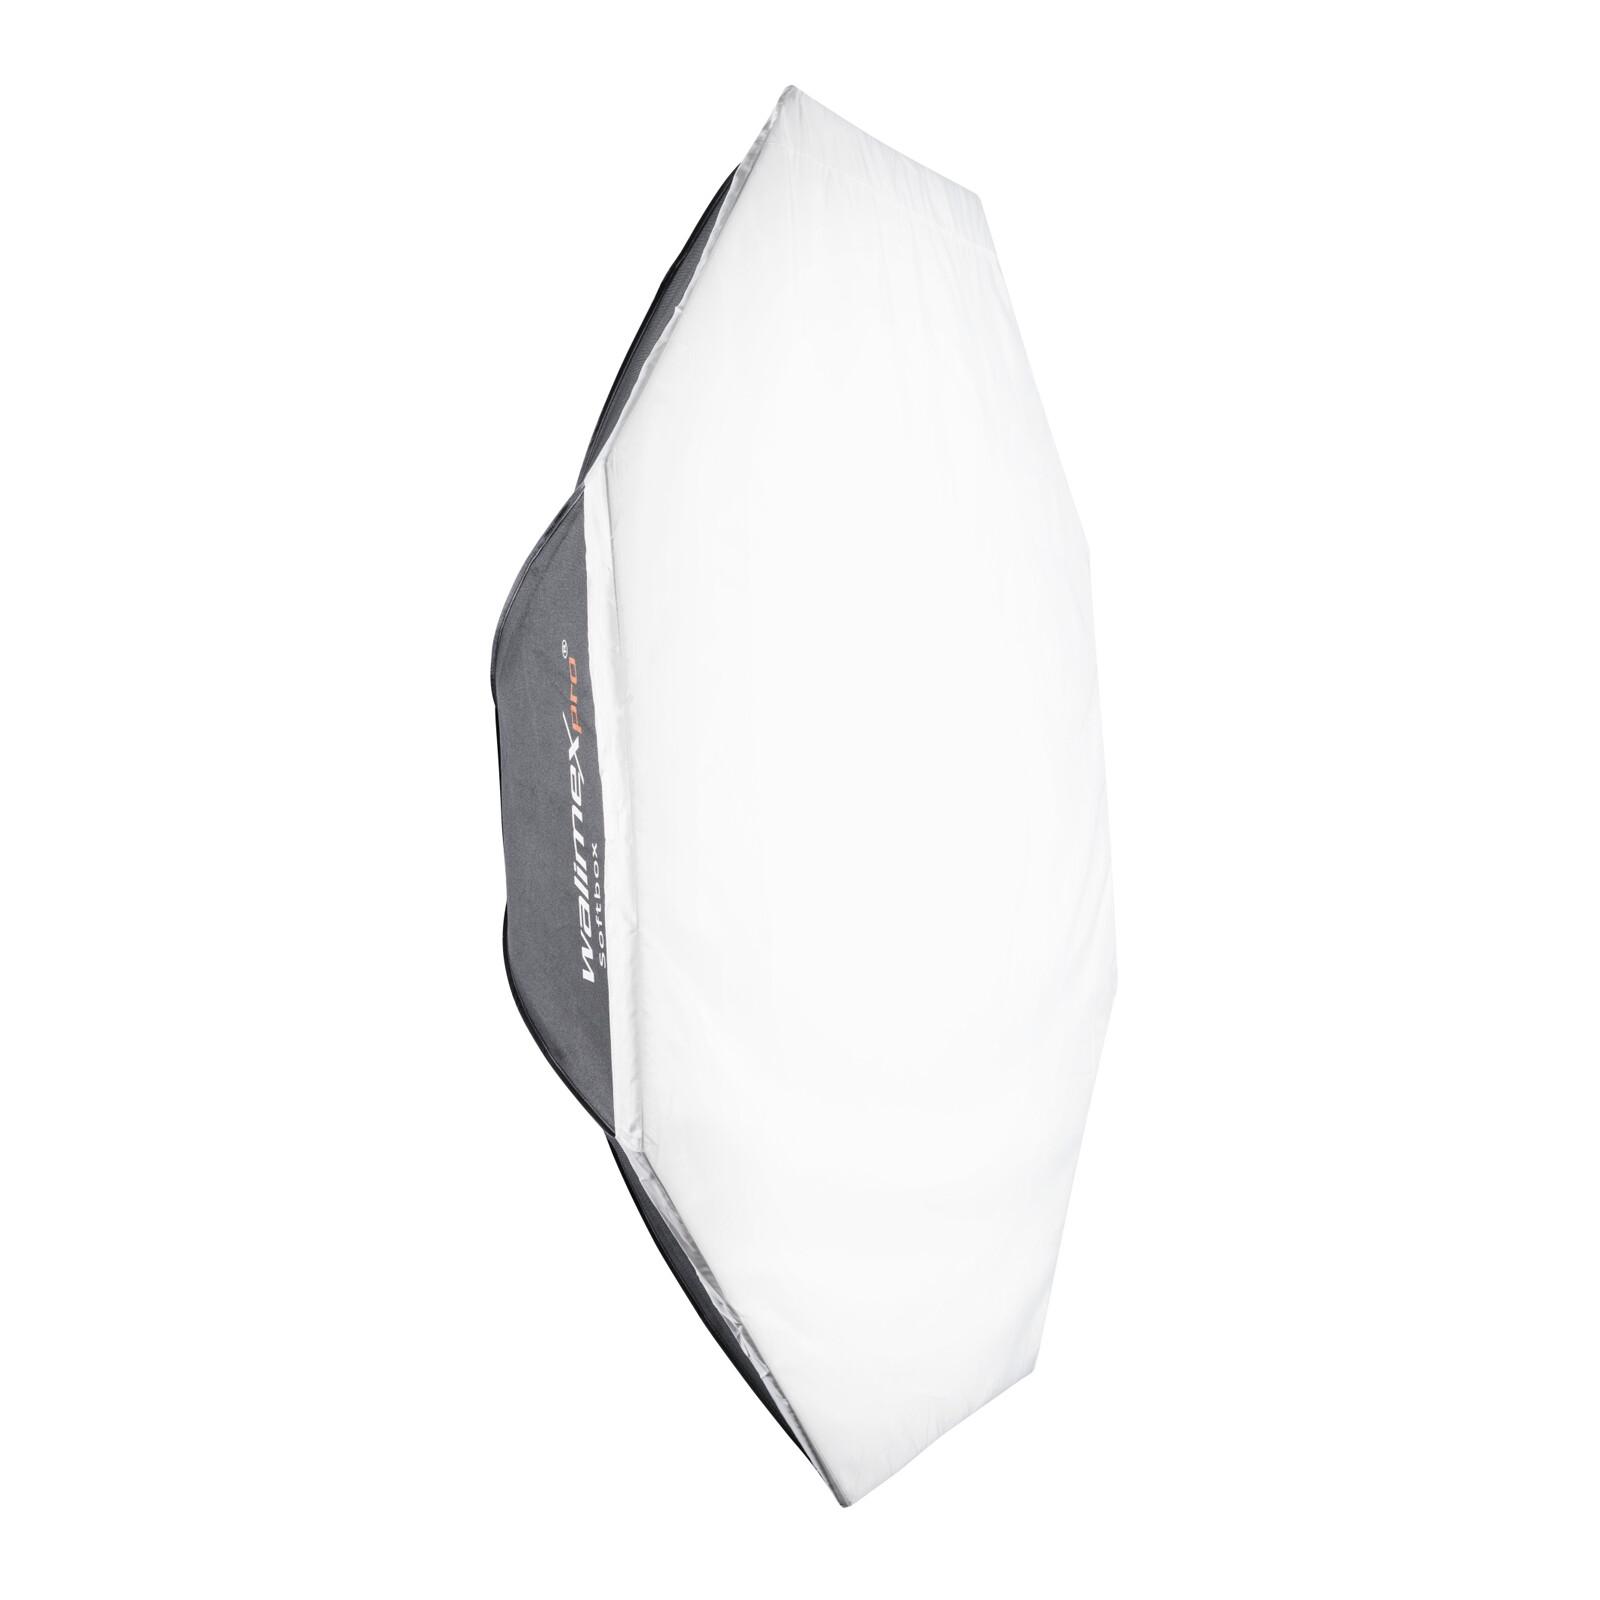 walimex pro Octagon Softbox Ø140cm für C&CR Serie